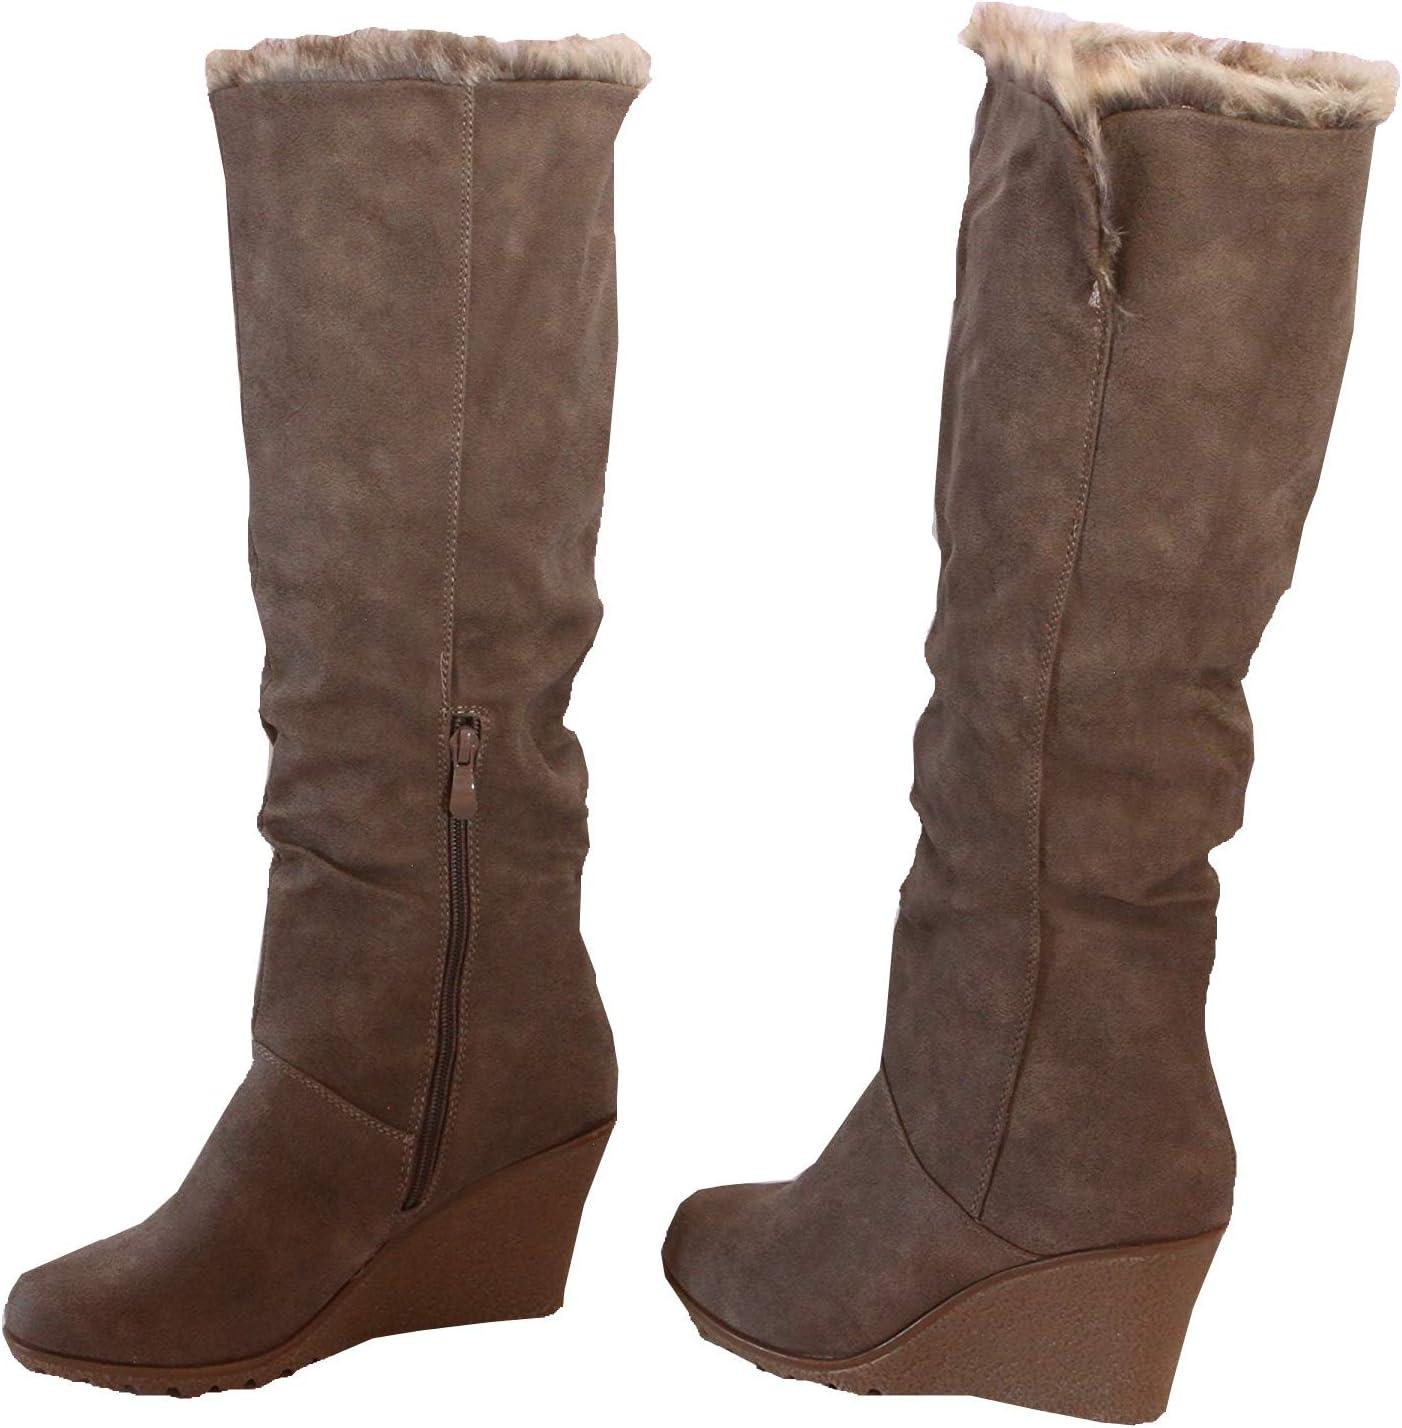 Women Winter-Boots Wedge Knee-High